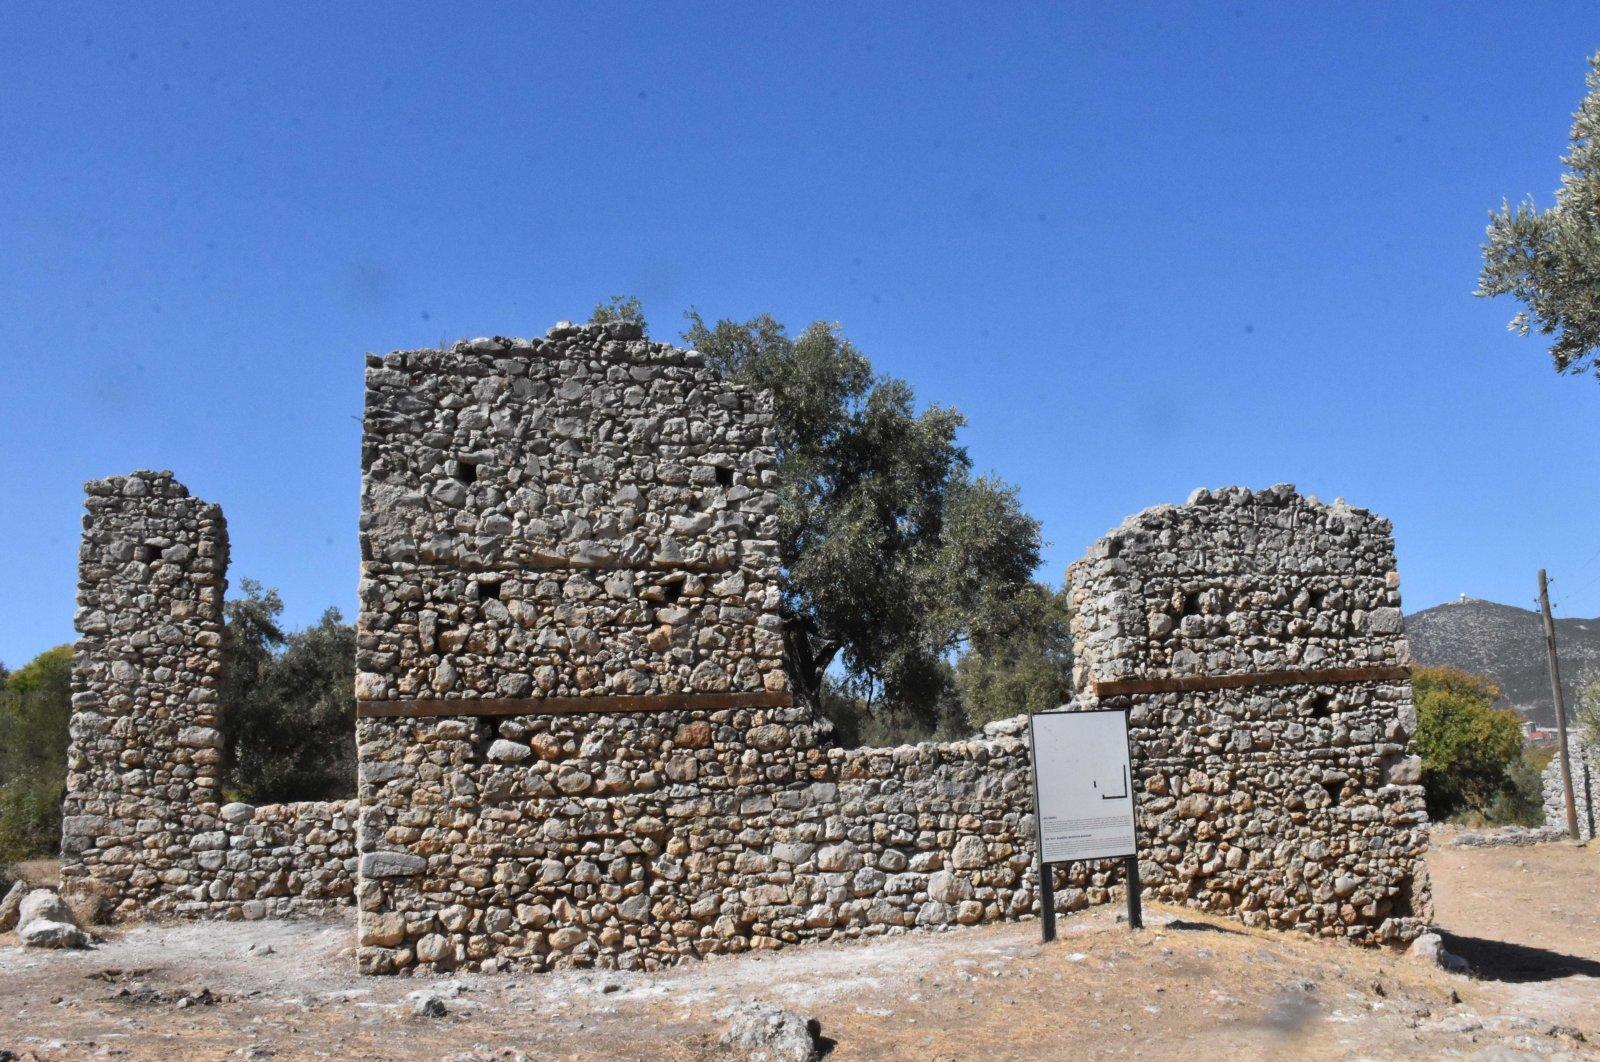 A ruin in the ancient city of Beçin in Muğla, southwestern Turkey, Oct. 12, 2020. (AA PHOTO)